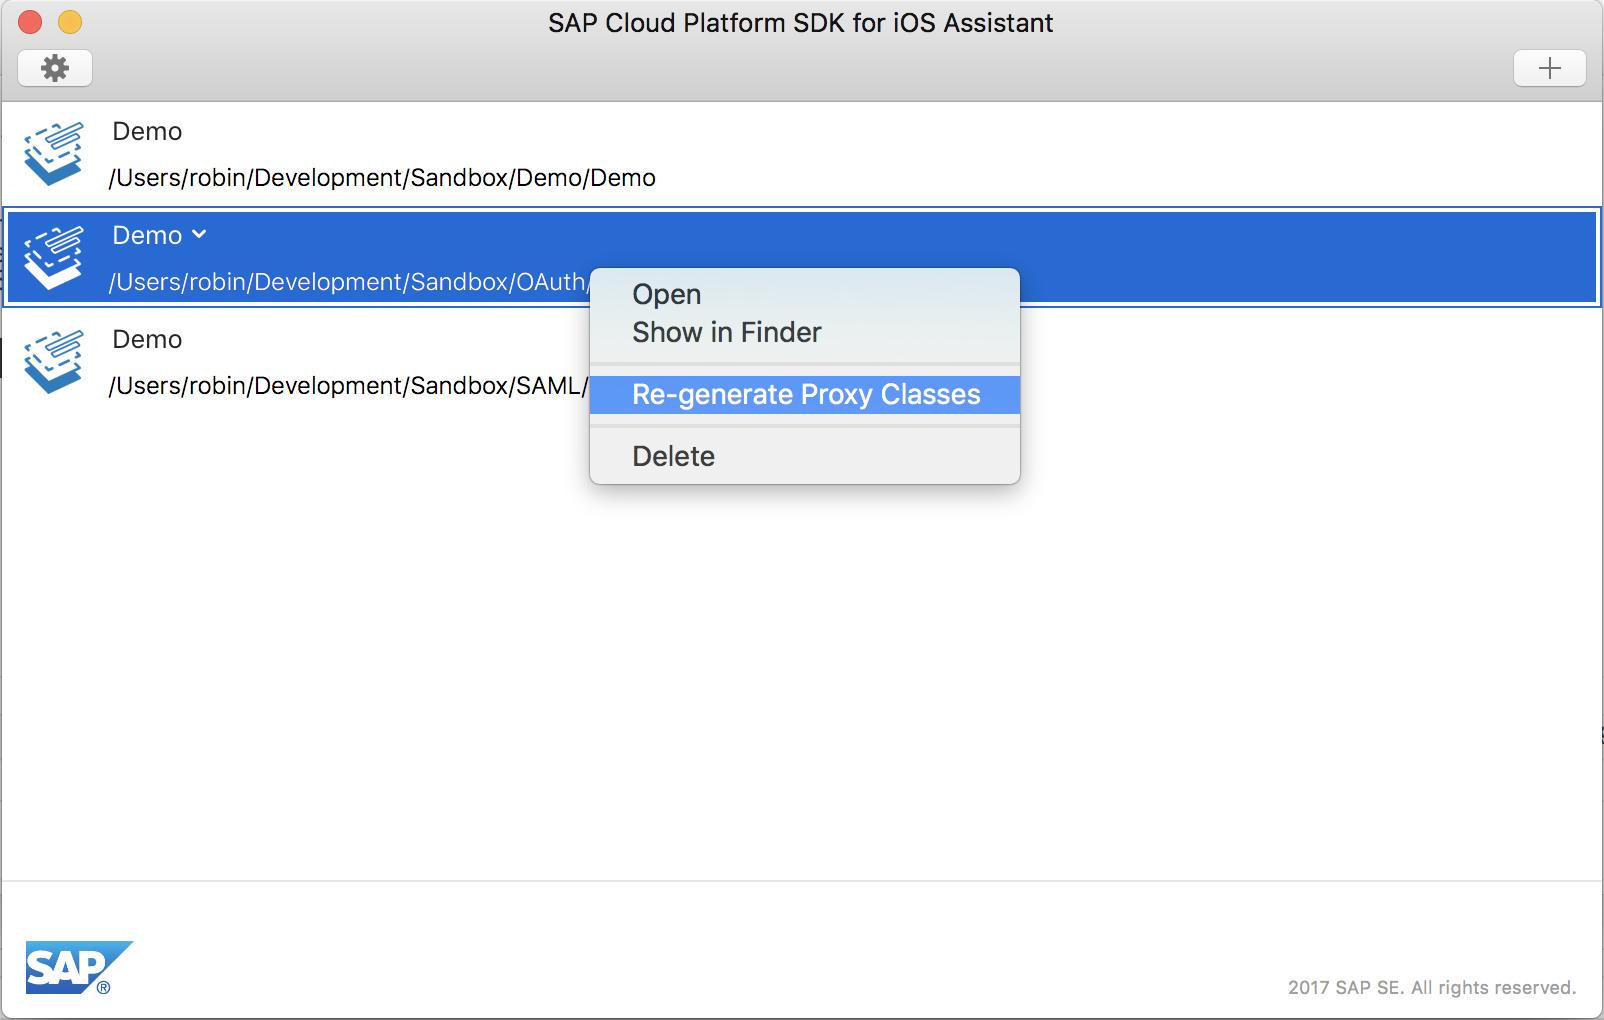 SAP Cloud Platform SDK for iOS – Did you know that… | SAP Blogs